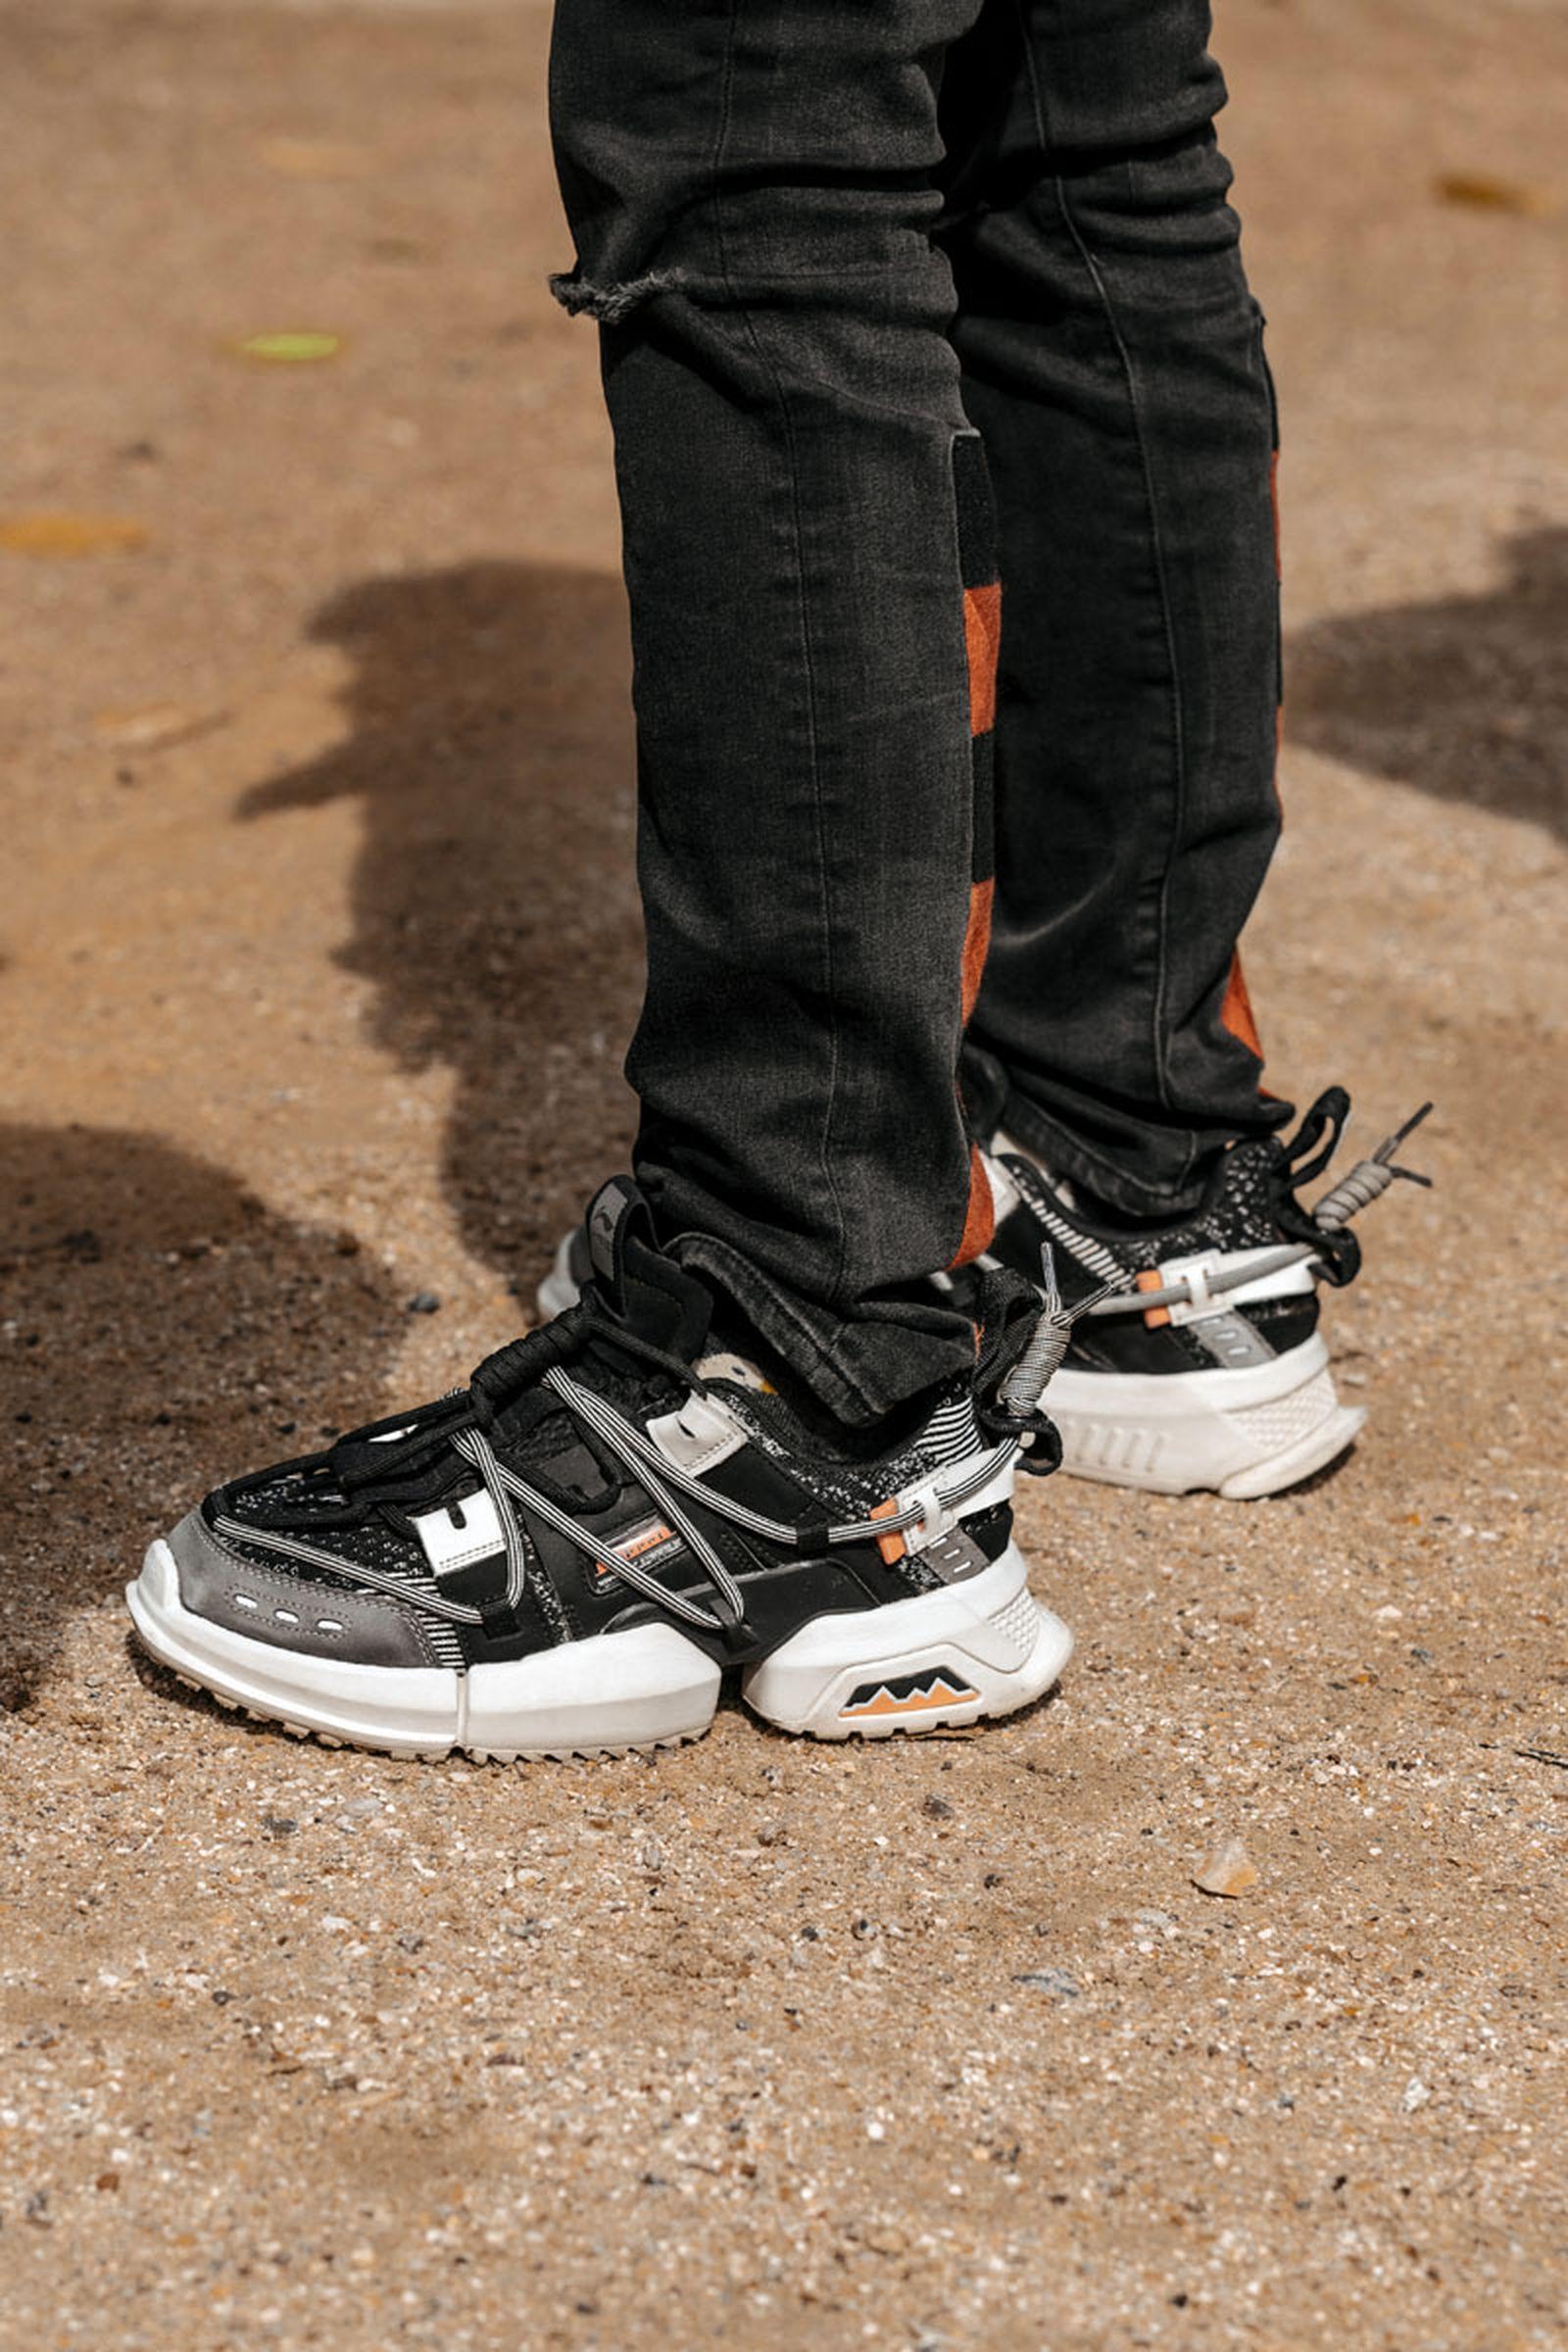 paris fashion week ss20 sneakers 08 Nike comme des garcons li ning